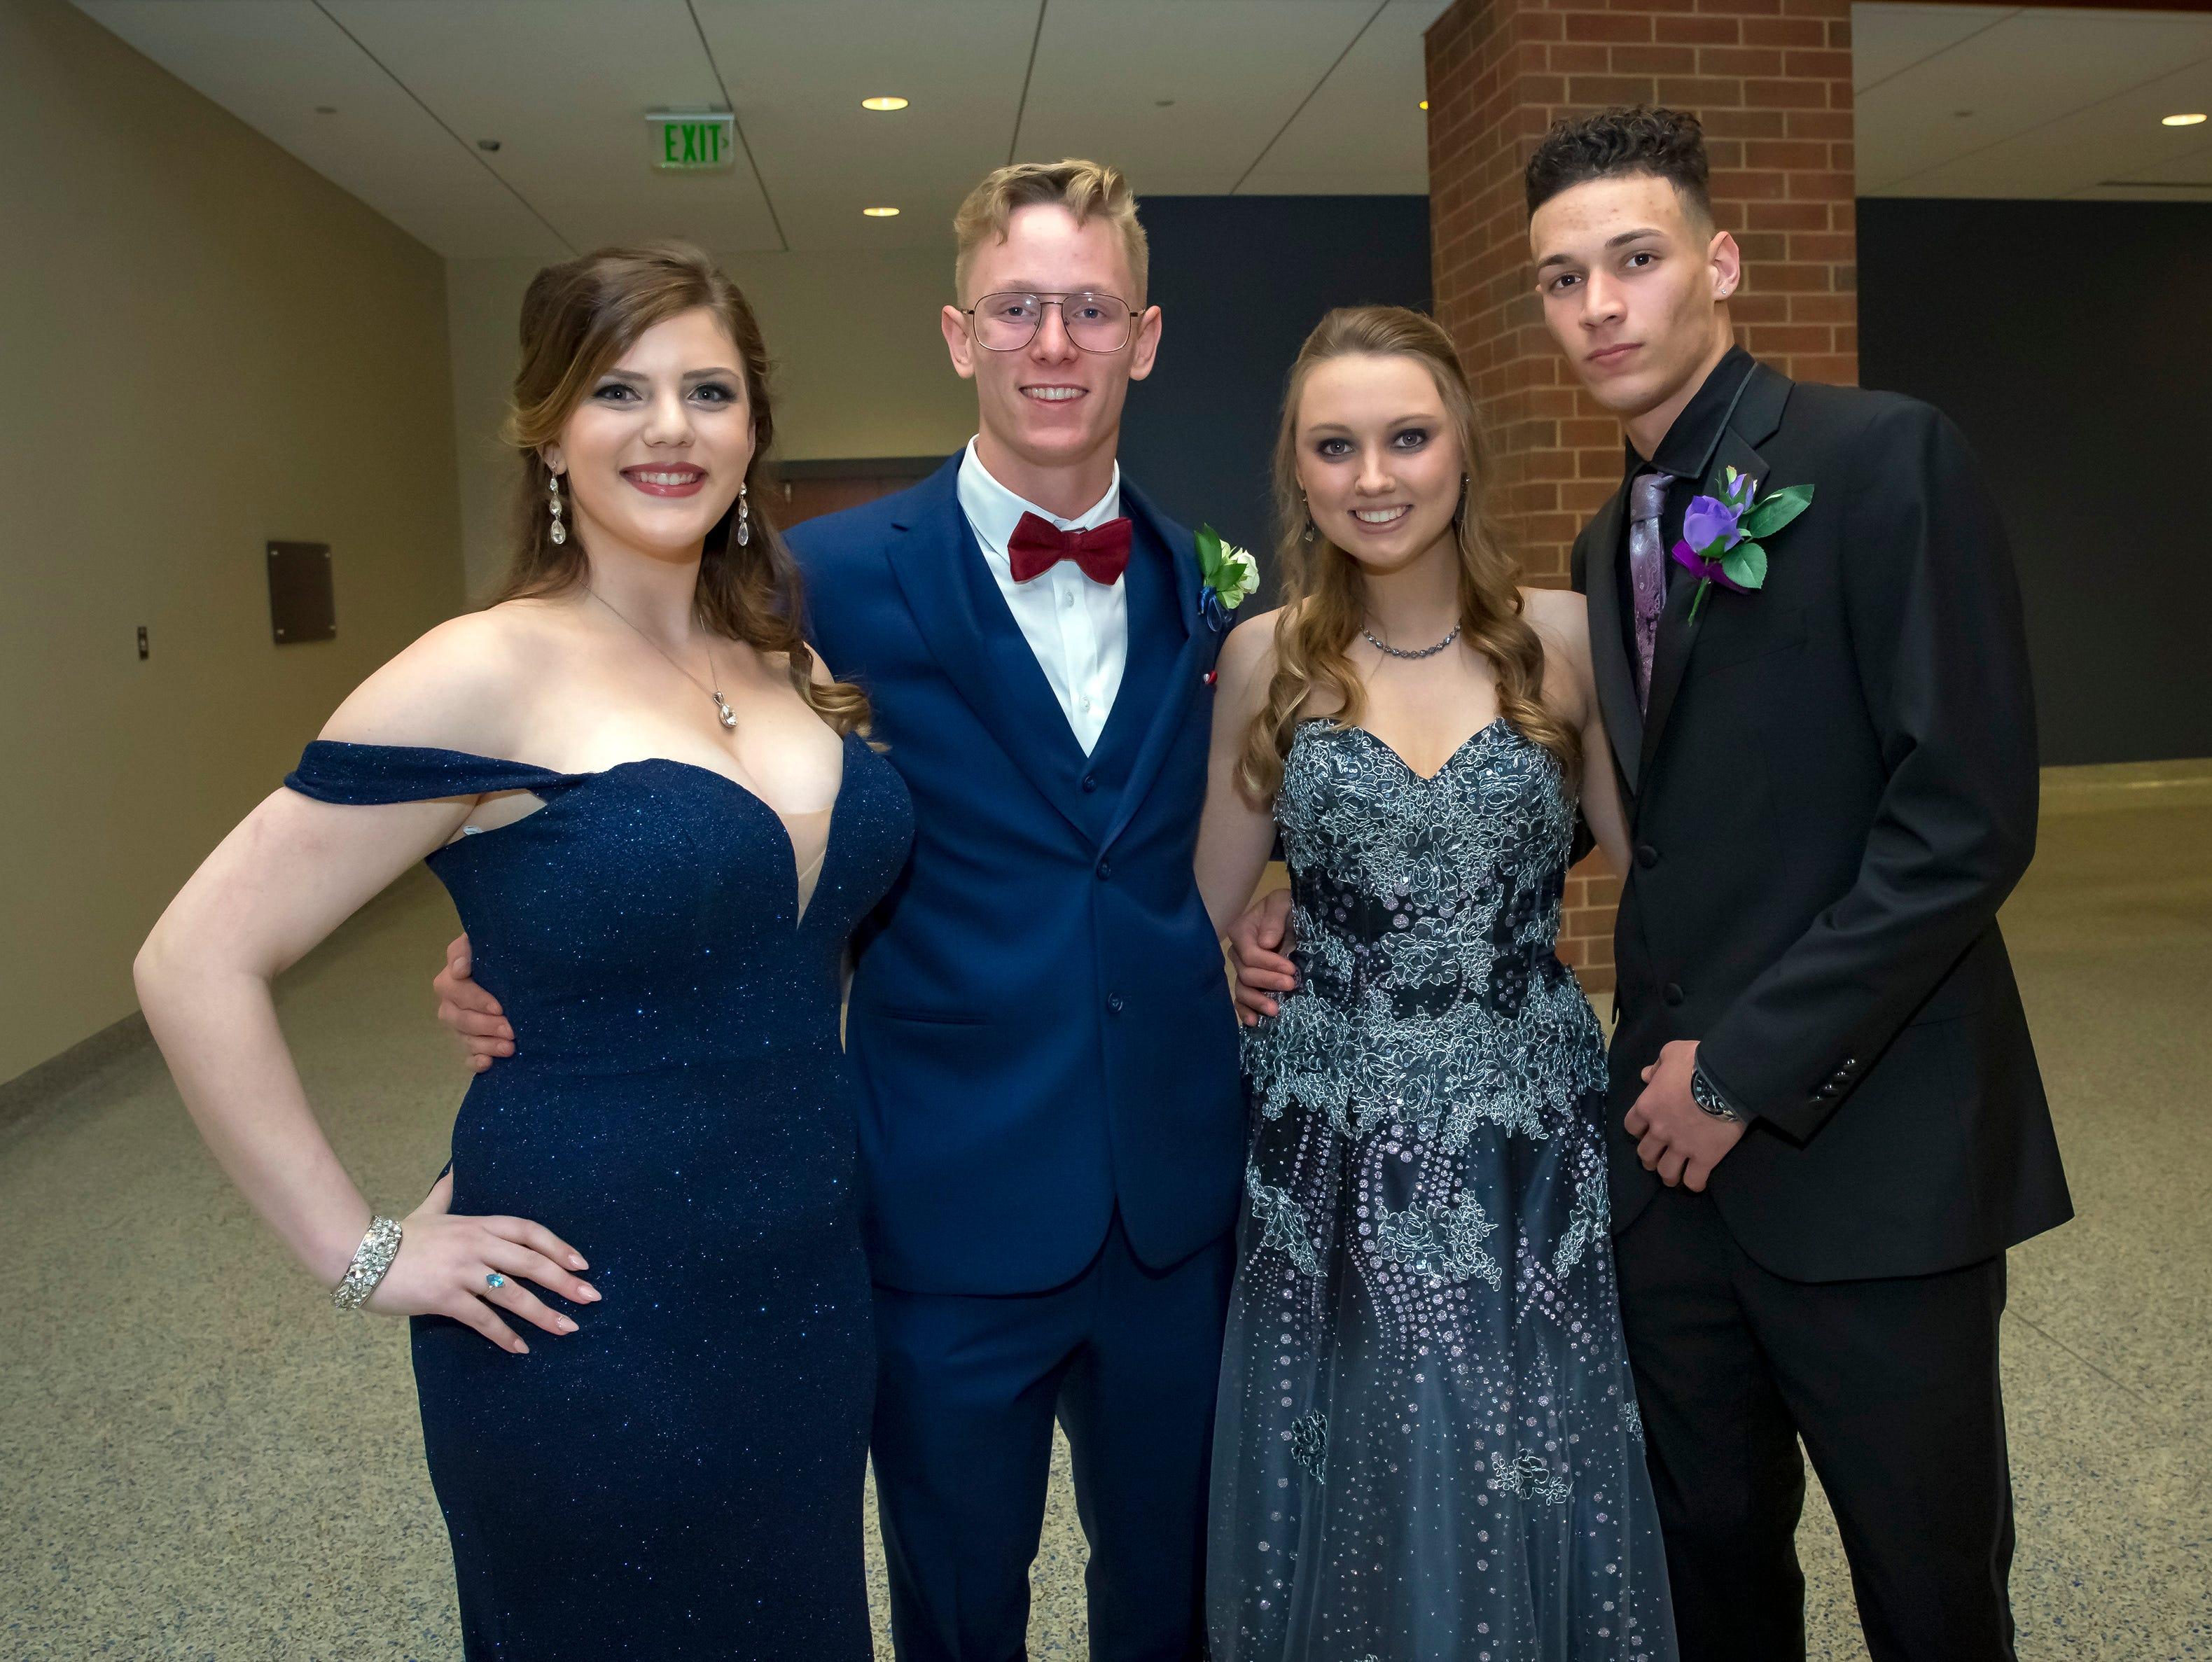 Ashley Adams, Jordan Turley, Sydnee Greer and Abdiel Ortega arrive at the Stewarts Creek High School prom held at MTSU, Friday, April 5, 2019.